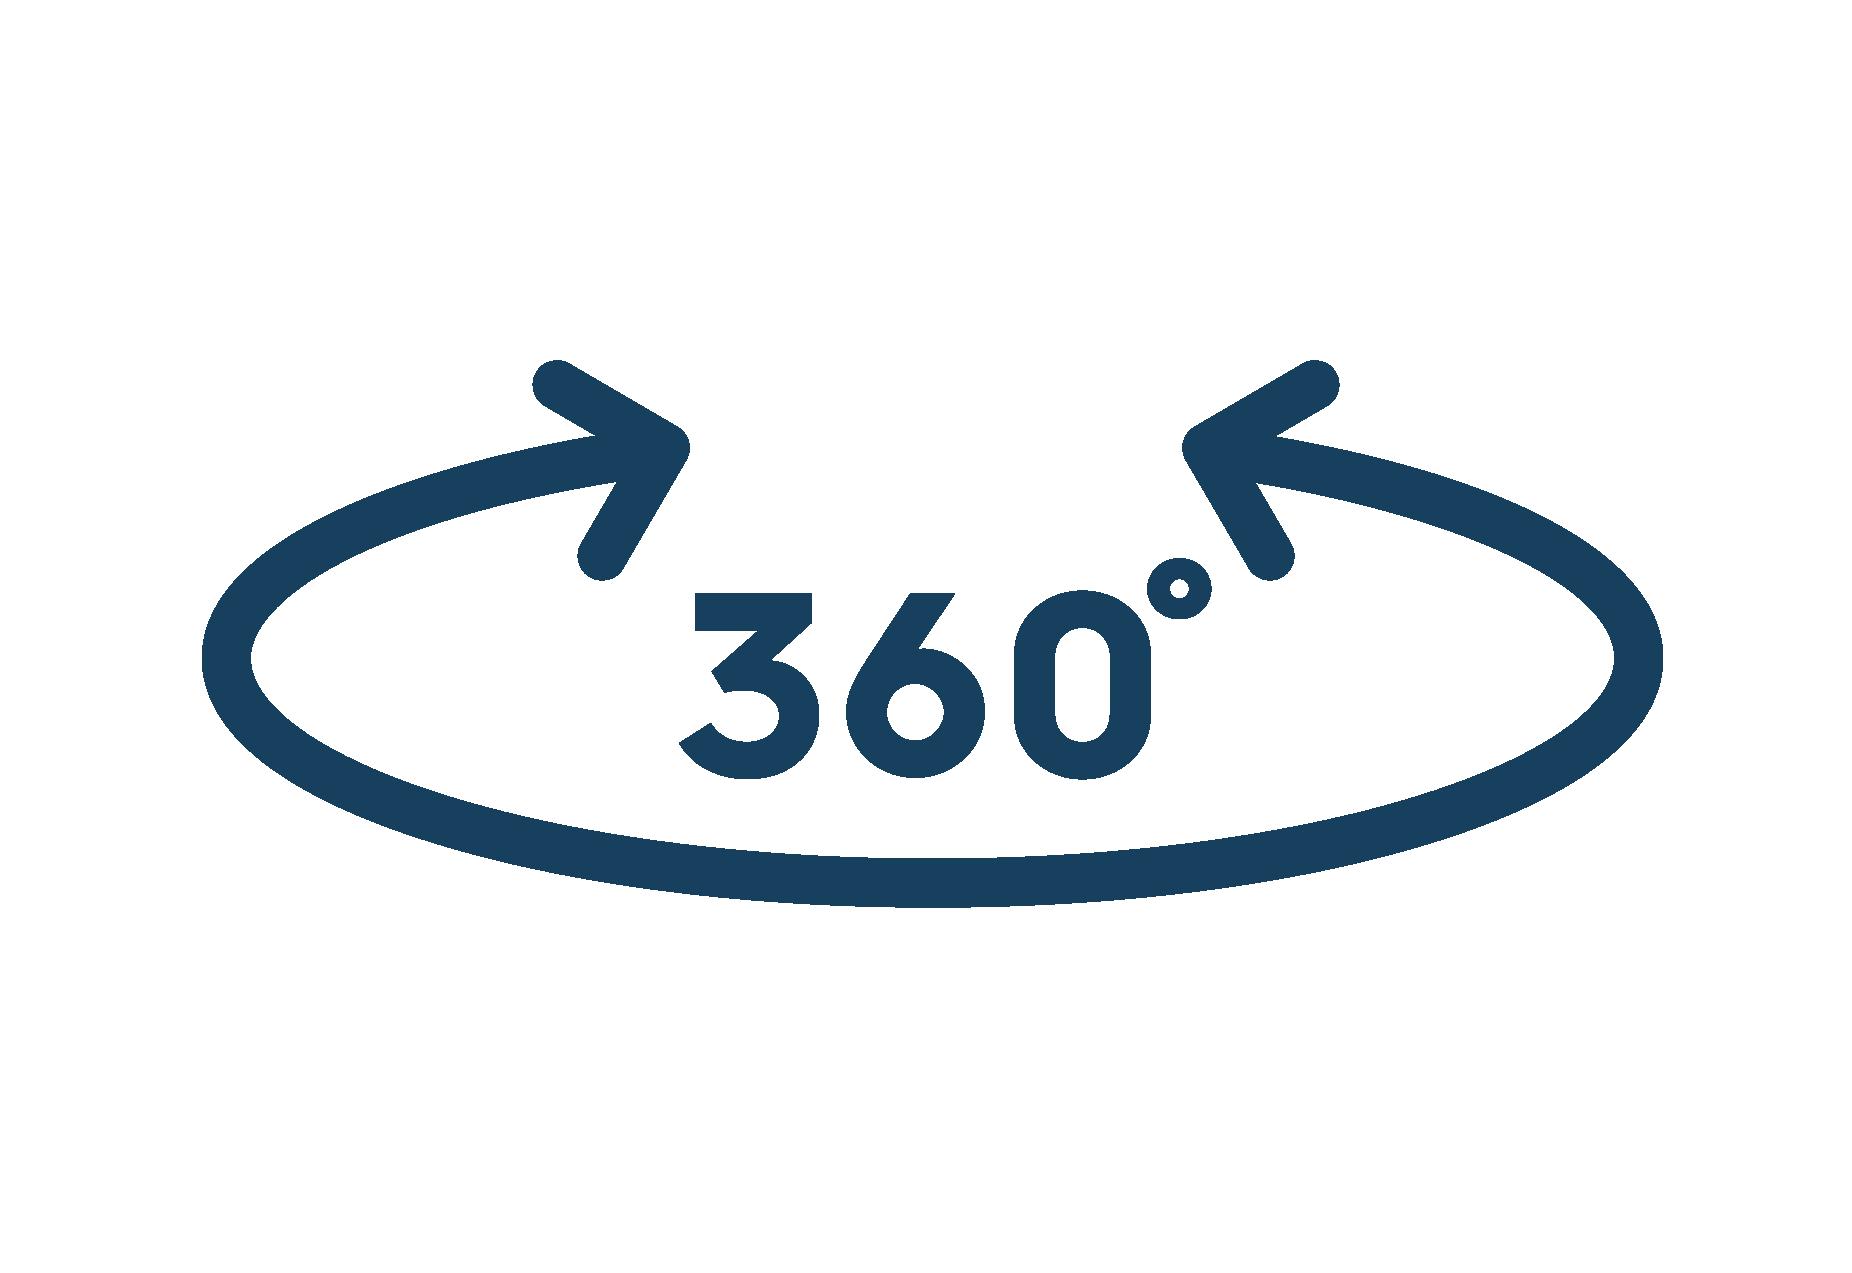 360 degree swivel icon